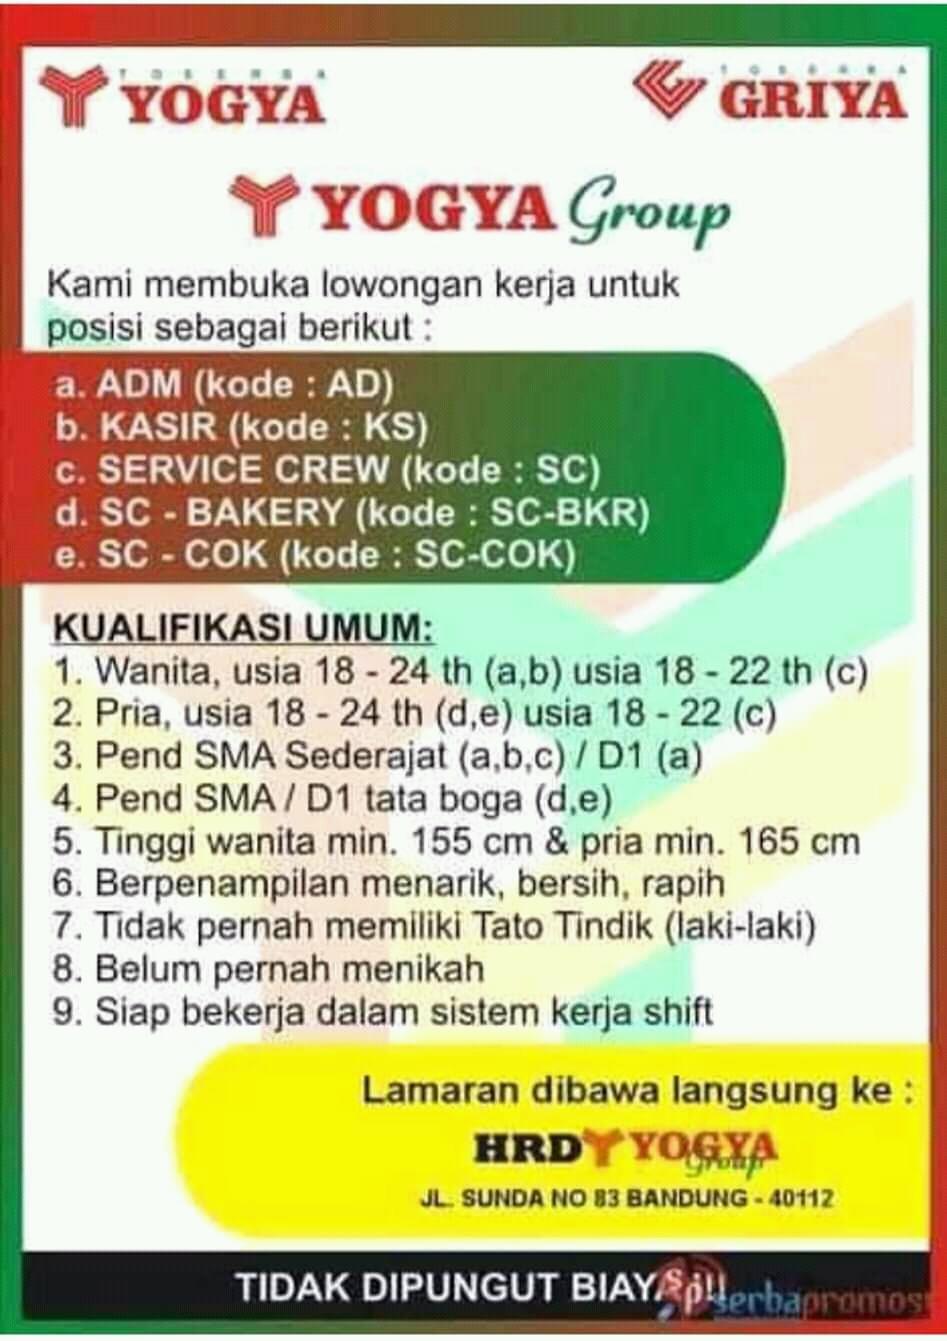 Lowongan Kerja Yogya Group Bandung Info Loker Bdg Informasi Lowongan Kerja Bandung